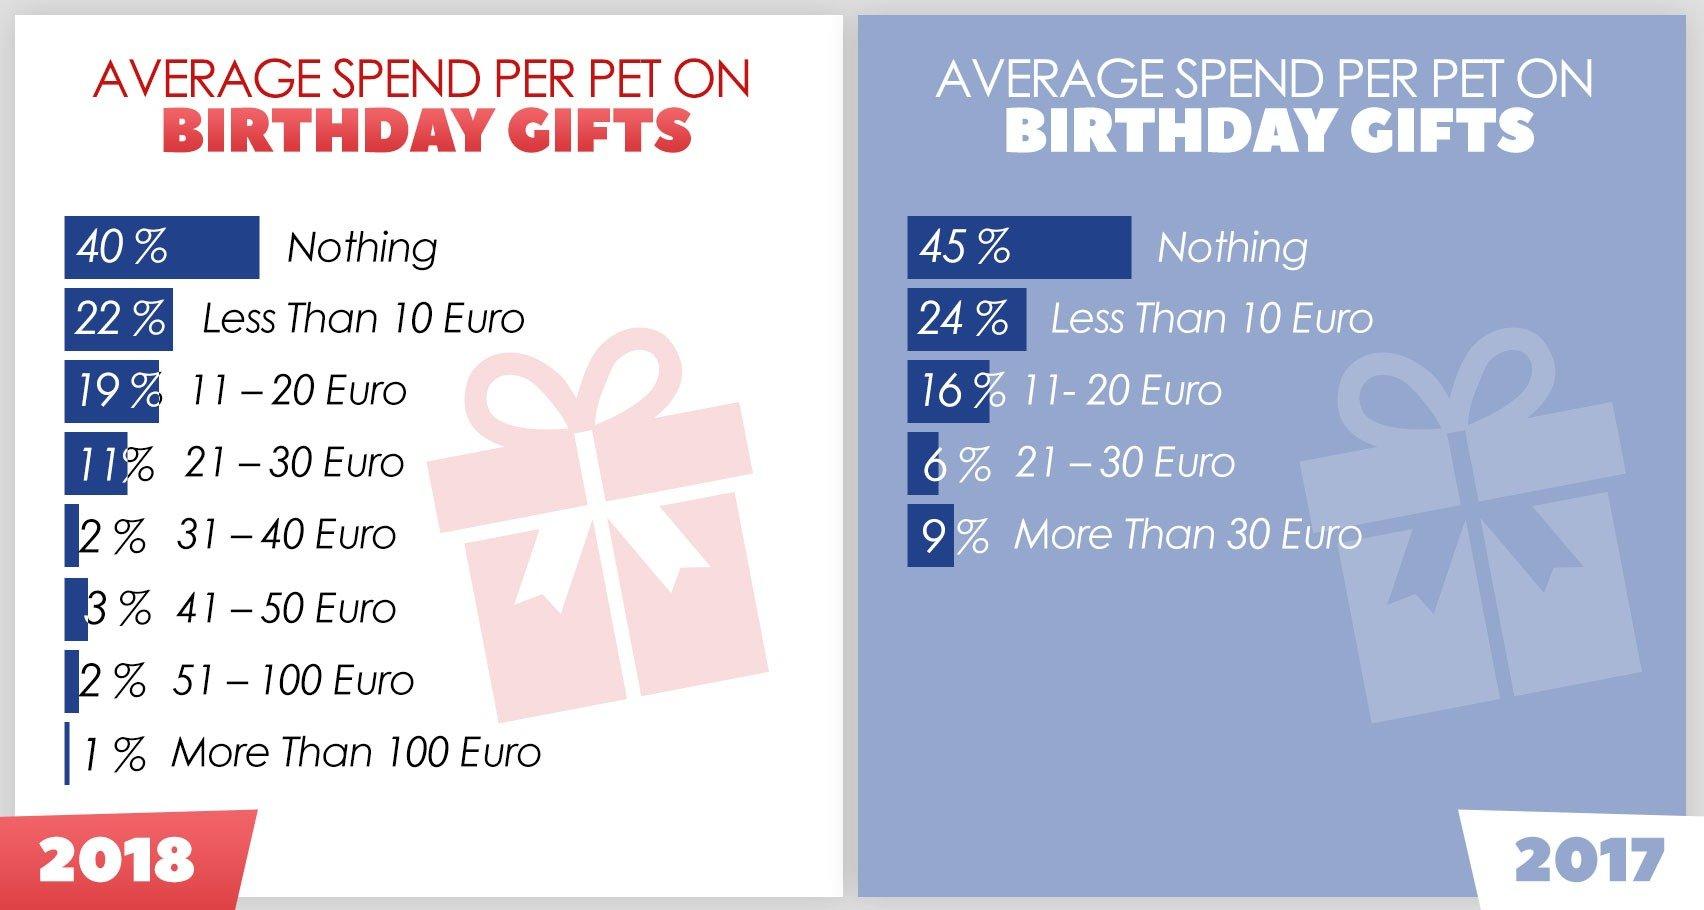 Pet Spend On Birthday